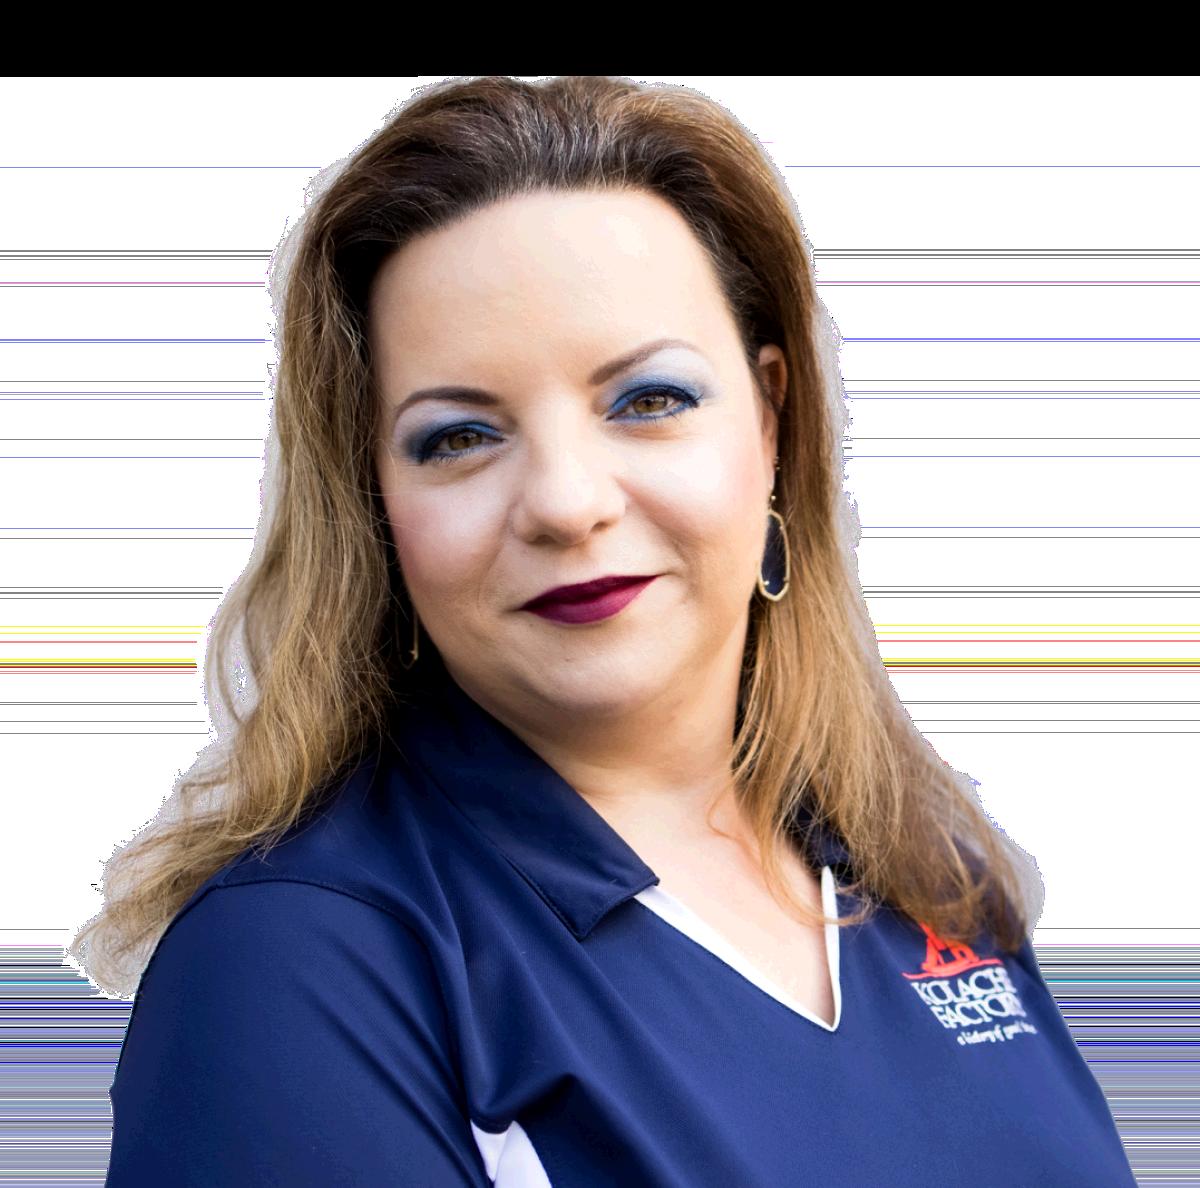 Headshot of Dawn Neilson from Kolache Factory